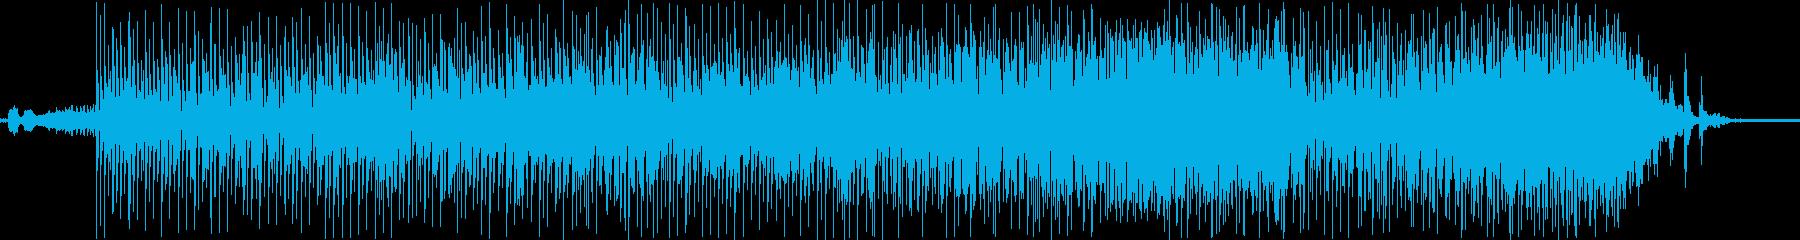 Iron Veilの再生済みの波形